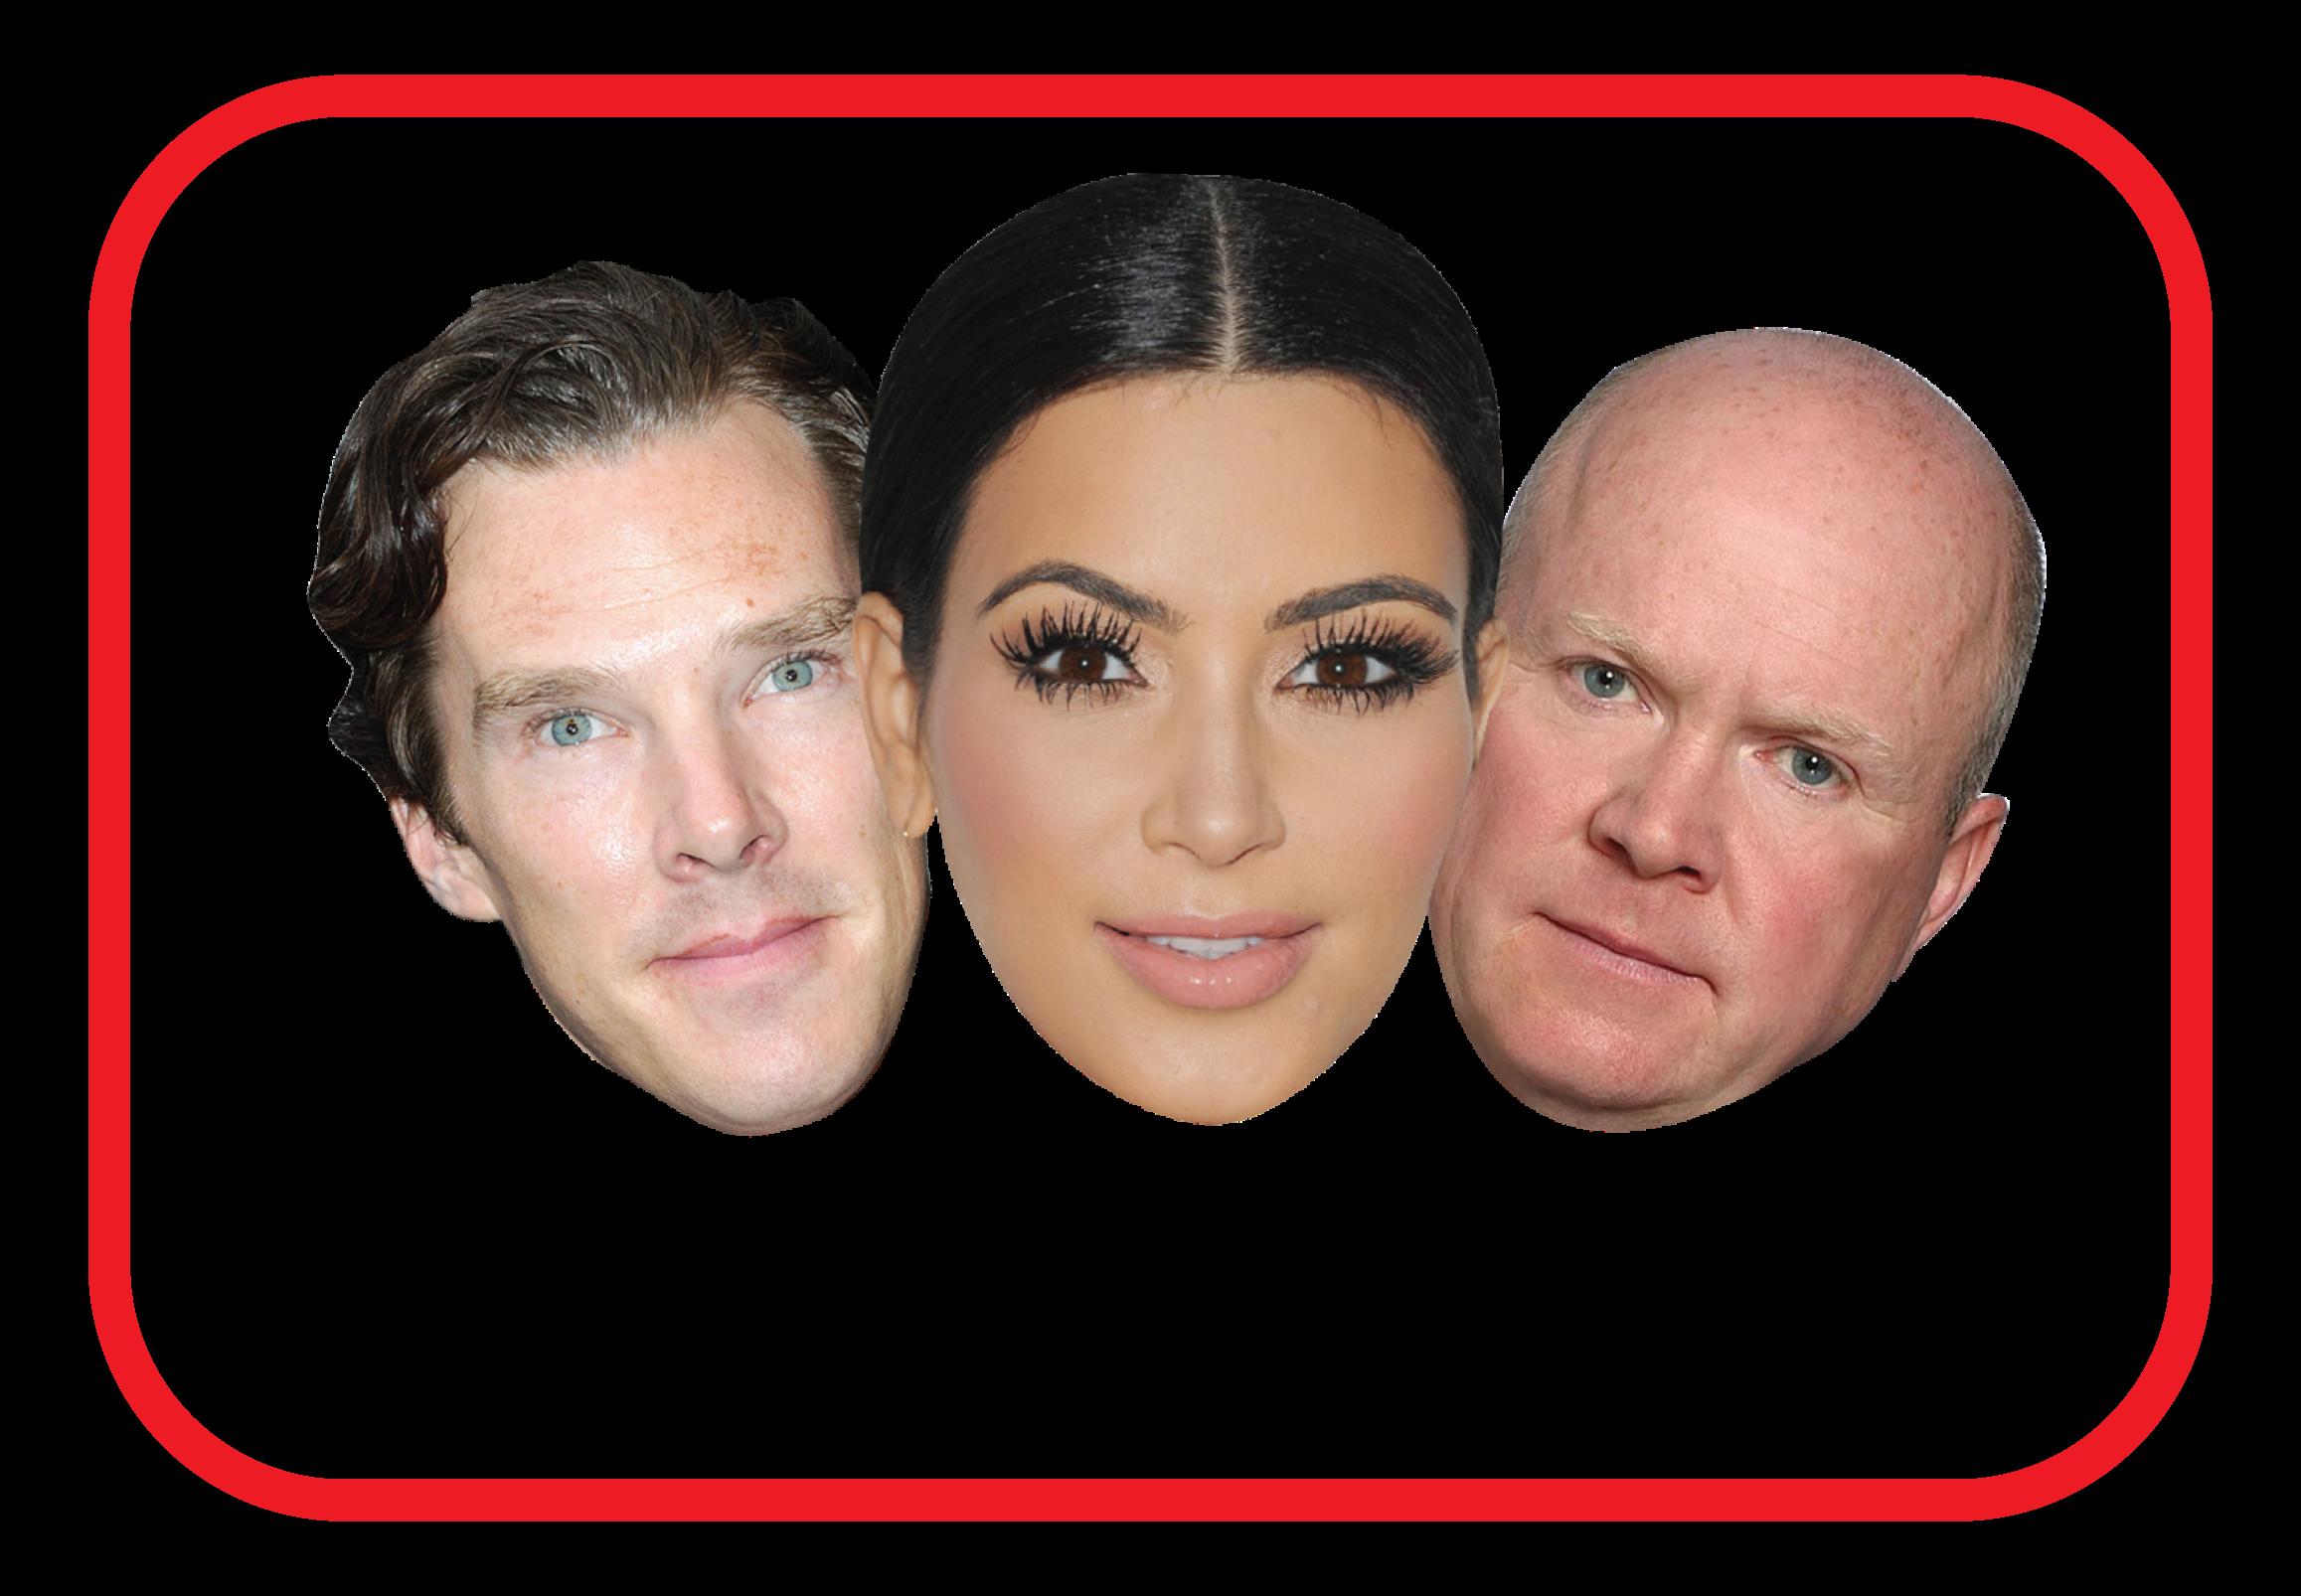 TV Star cardboard masks